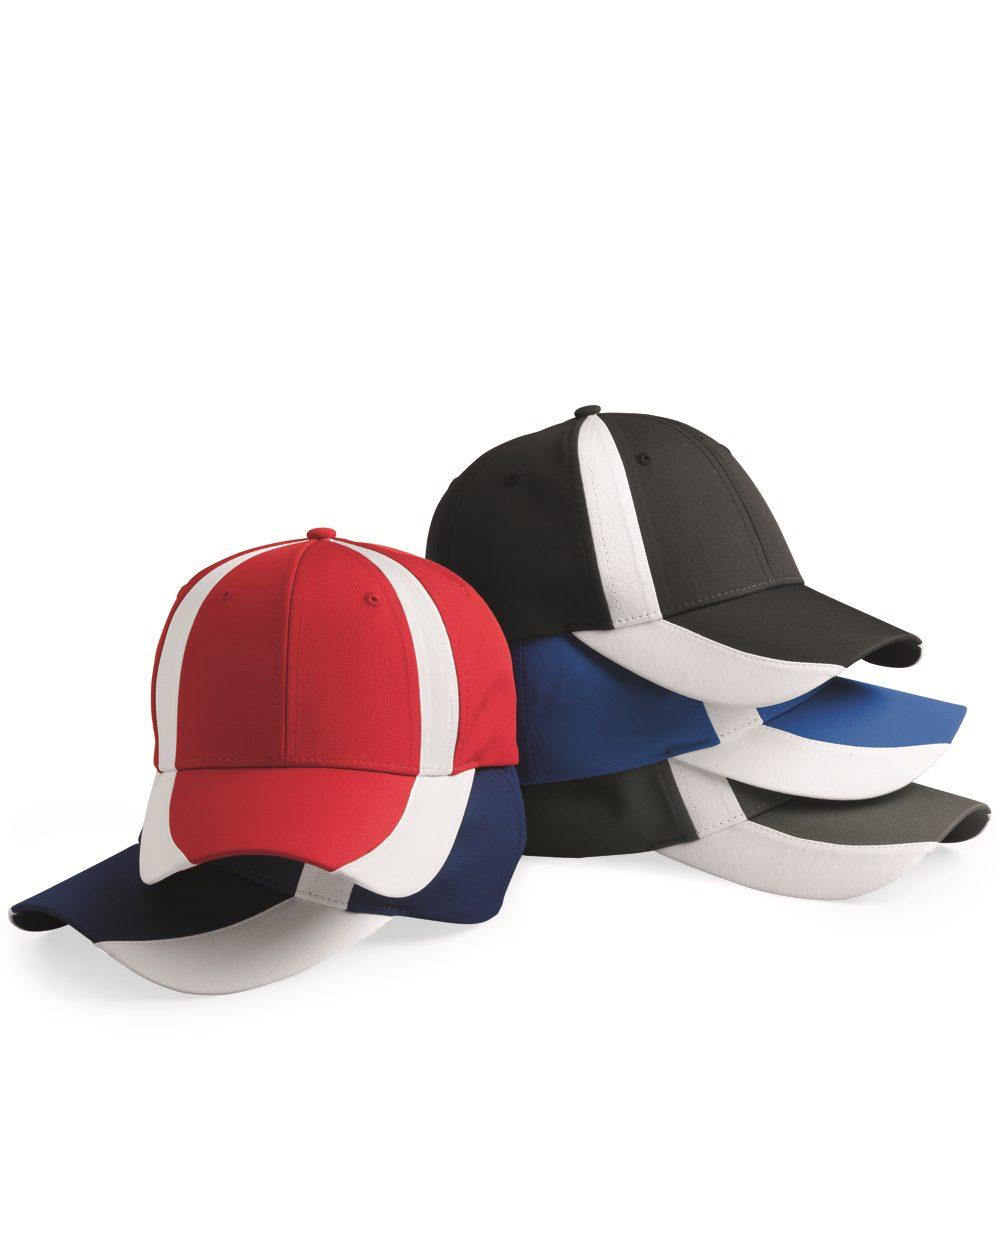 Authentic Headwear AH50帽子